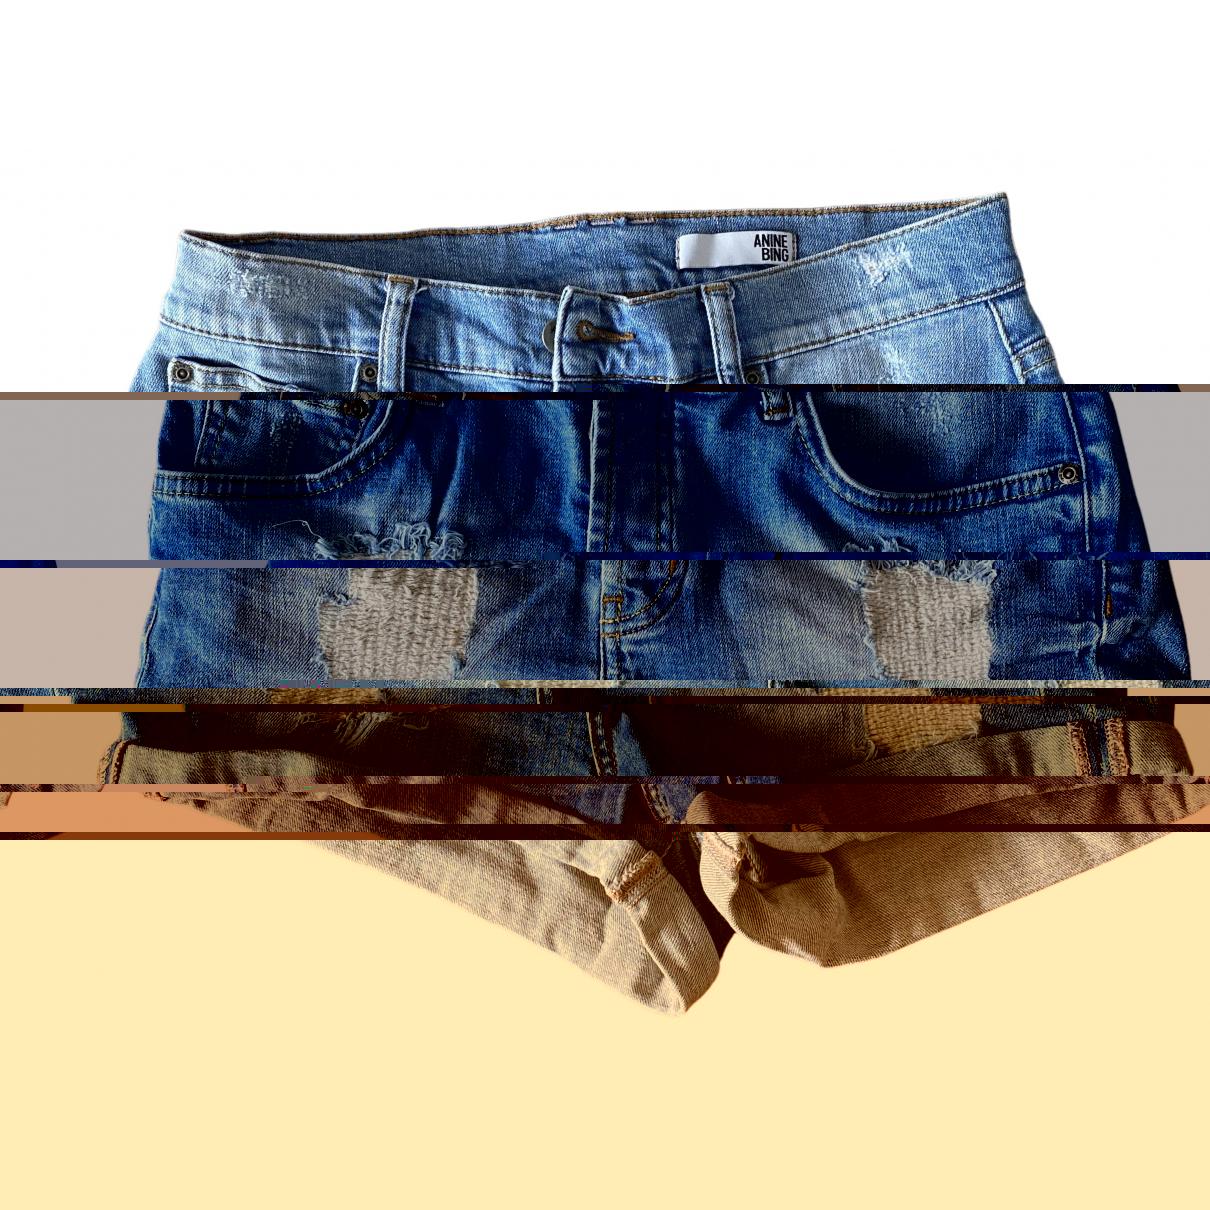 Anine Bing \N Shorts in  Blau Denim - Jeans